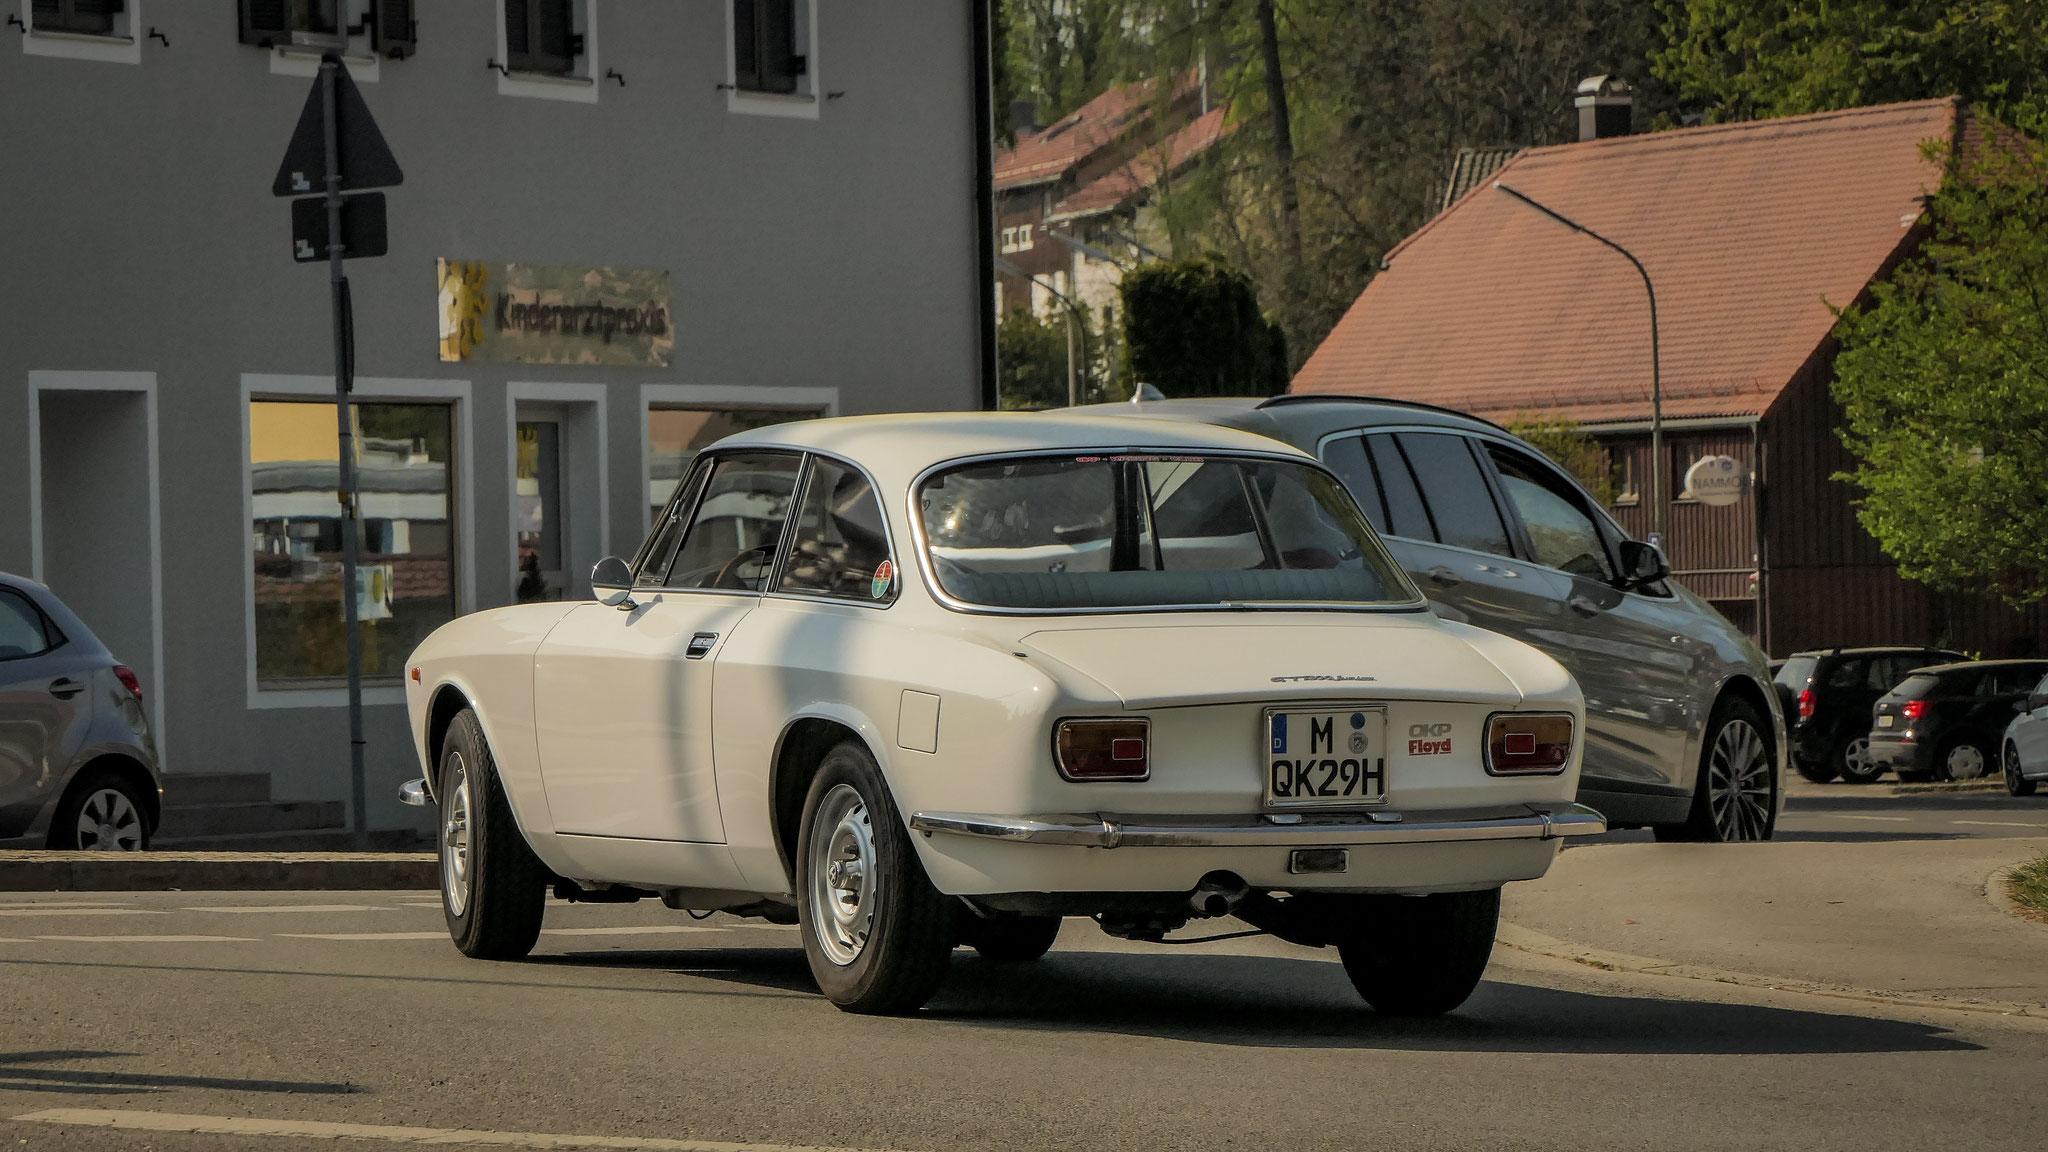 Alfa Romeo Giulia Sprint GT - M-QK-29H